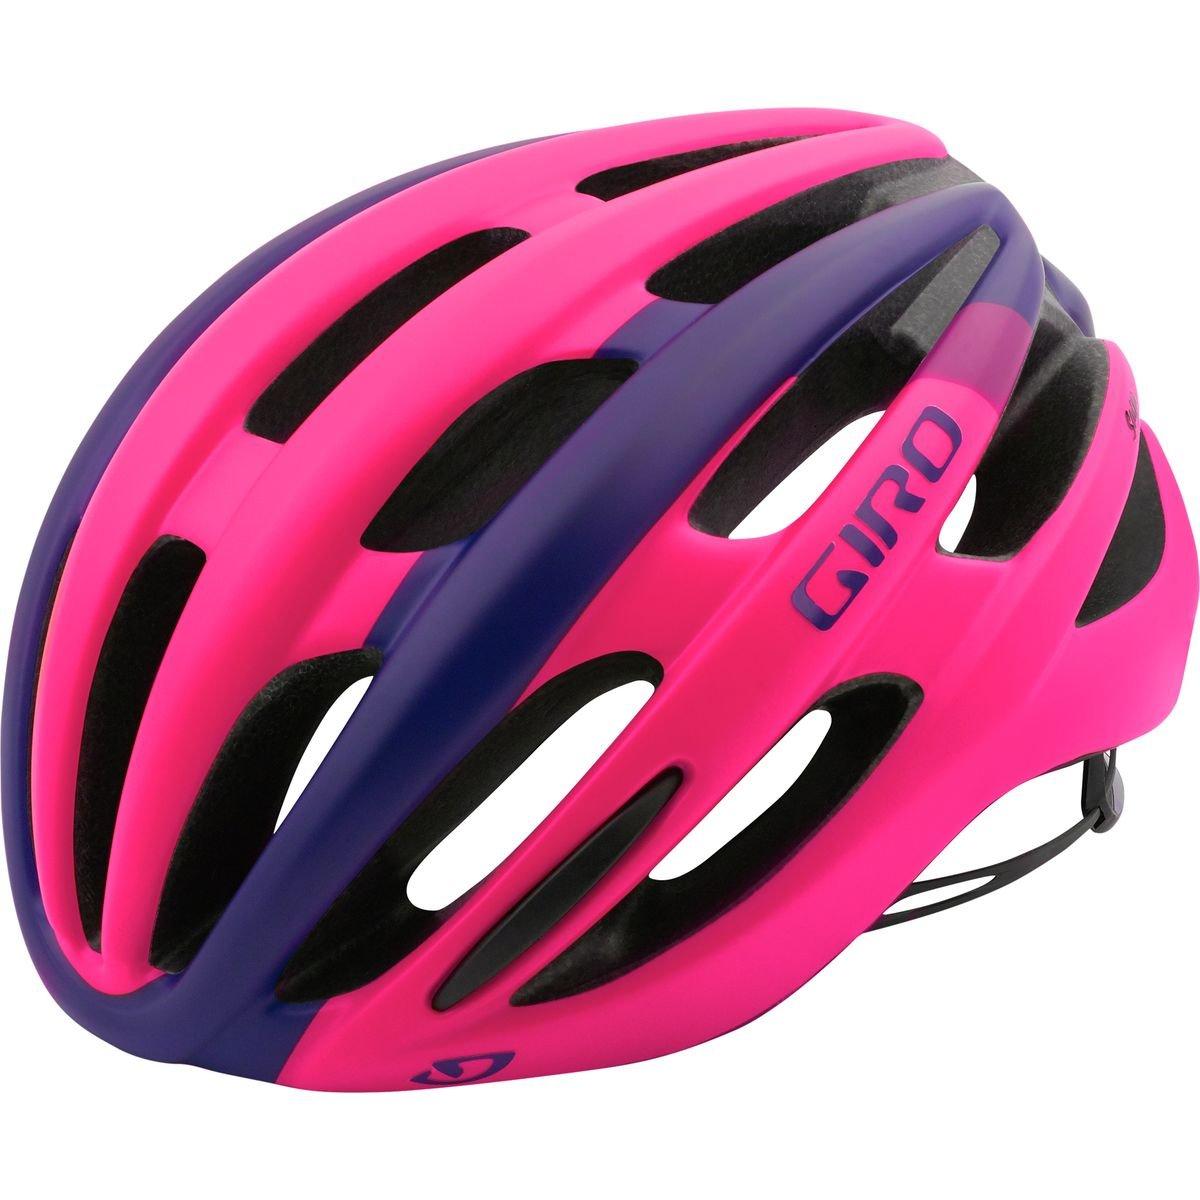 Giro Saga Cycling Helmet - Women's Matte Bright Pink Small